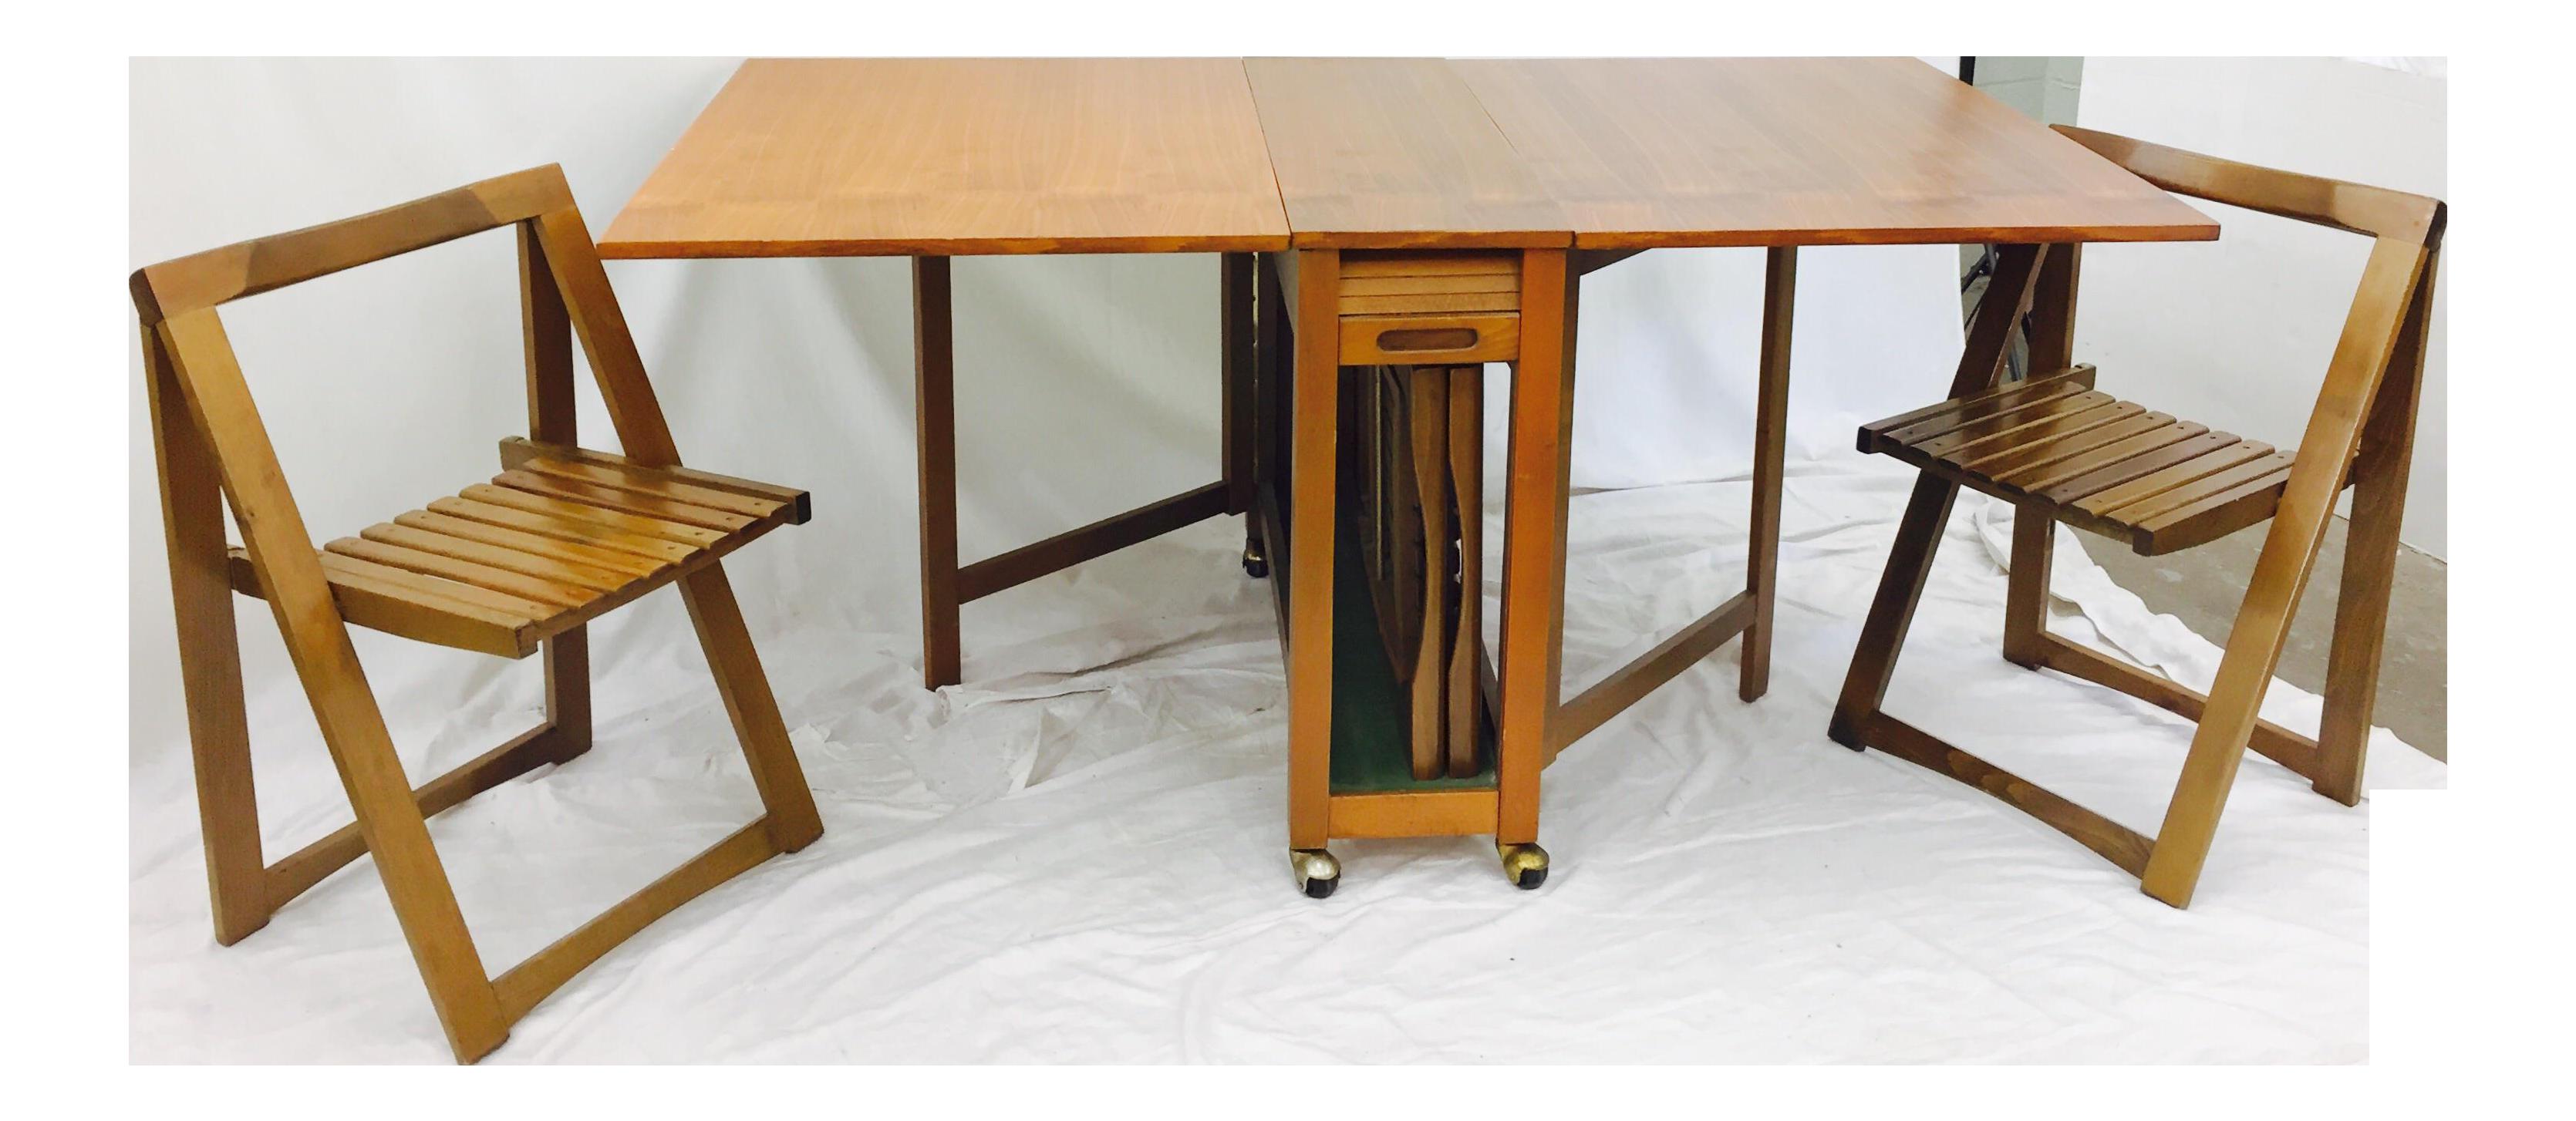 Danish Modern Hideaway Gateleg Table & Chairs - Set of 3 | Chairish